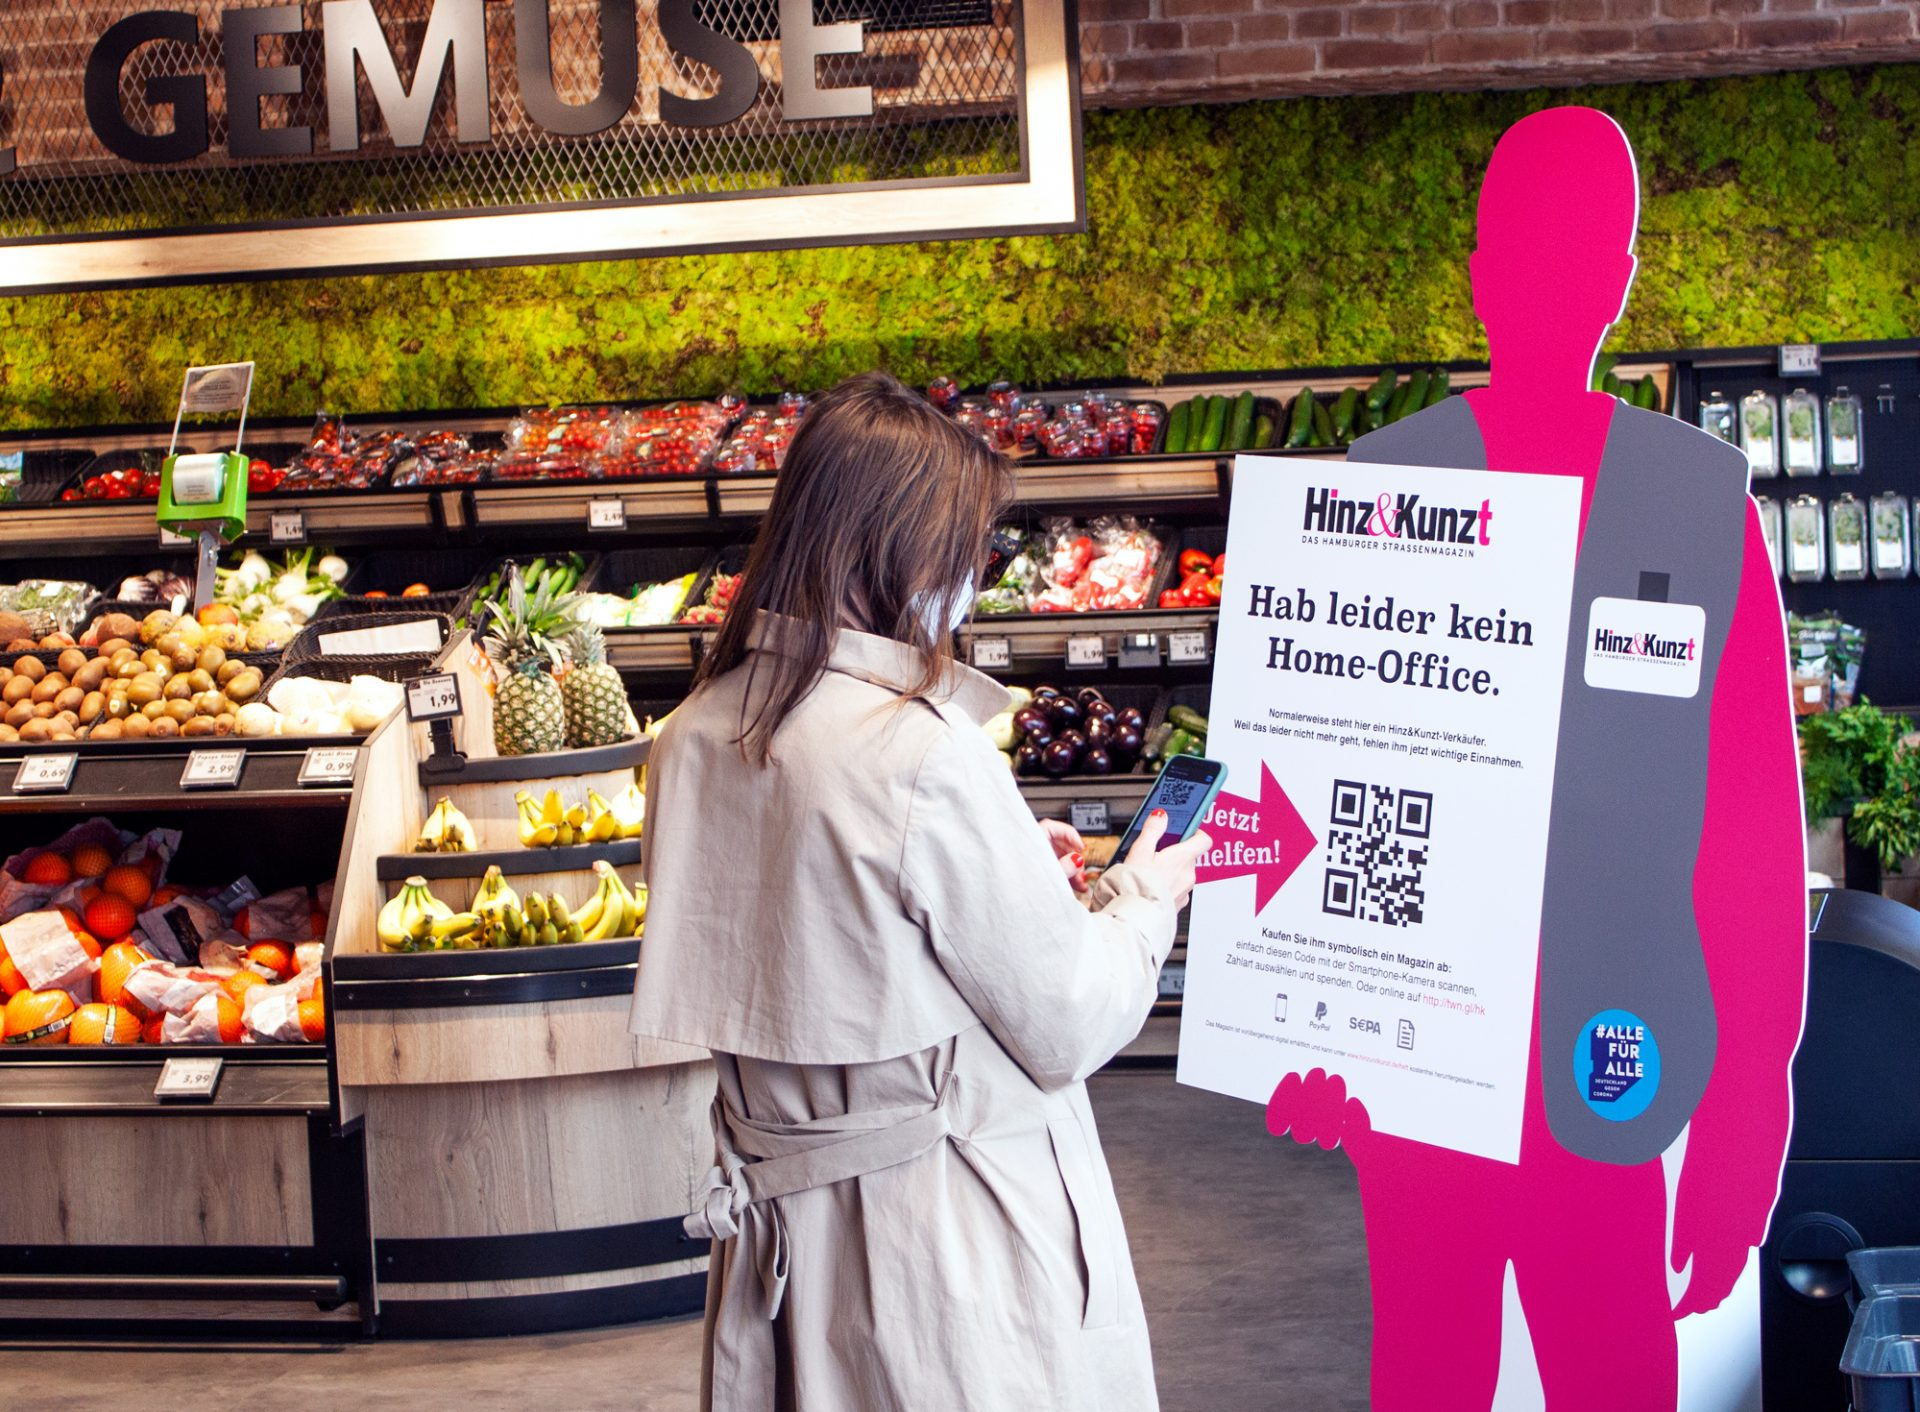 Philipp und Keuntje entwickelt kontaktlosen Hinz Kunzt Verkäufer Supermarkt